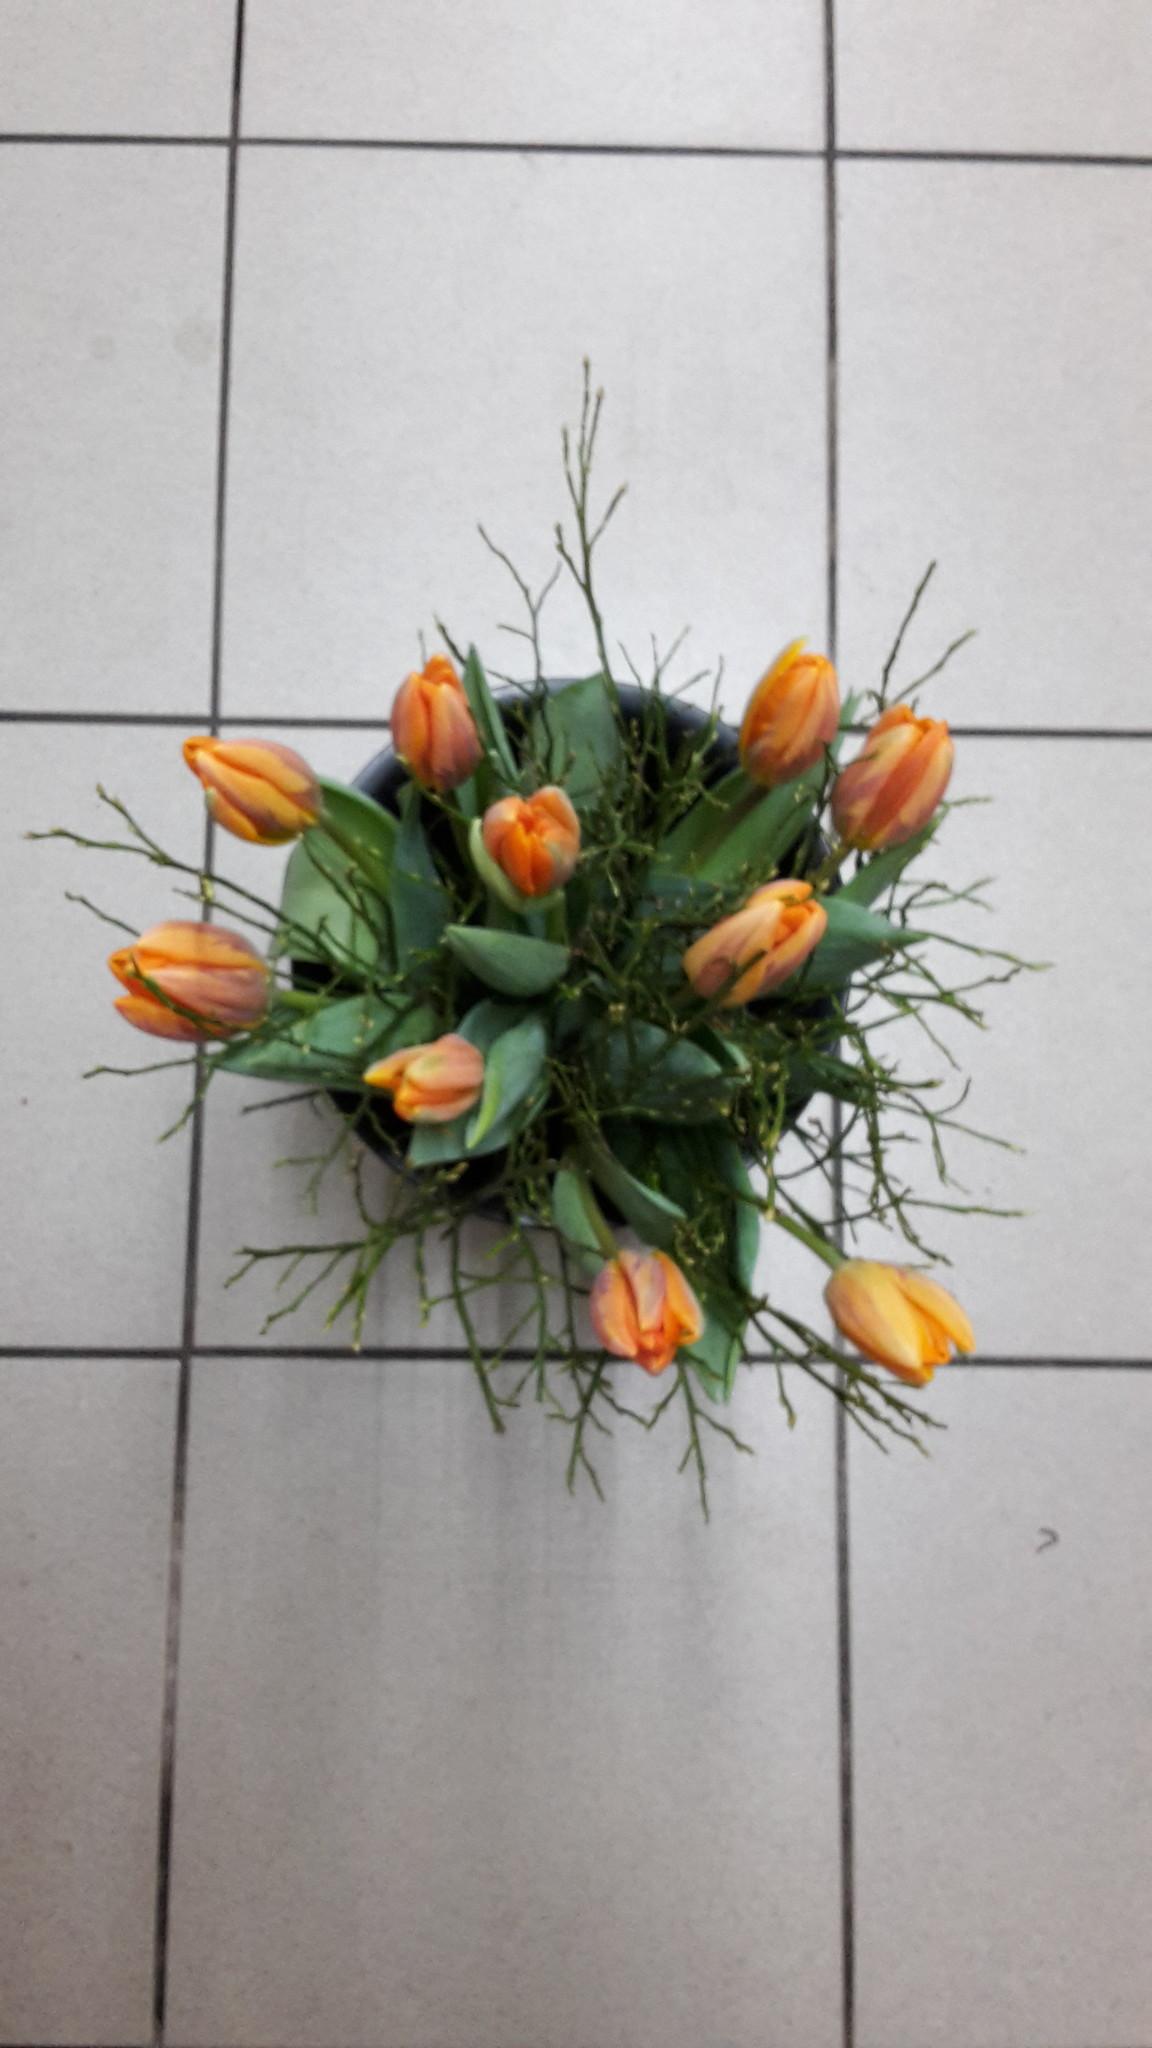 Tulpen boeket (10 tulpen en bosbes)